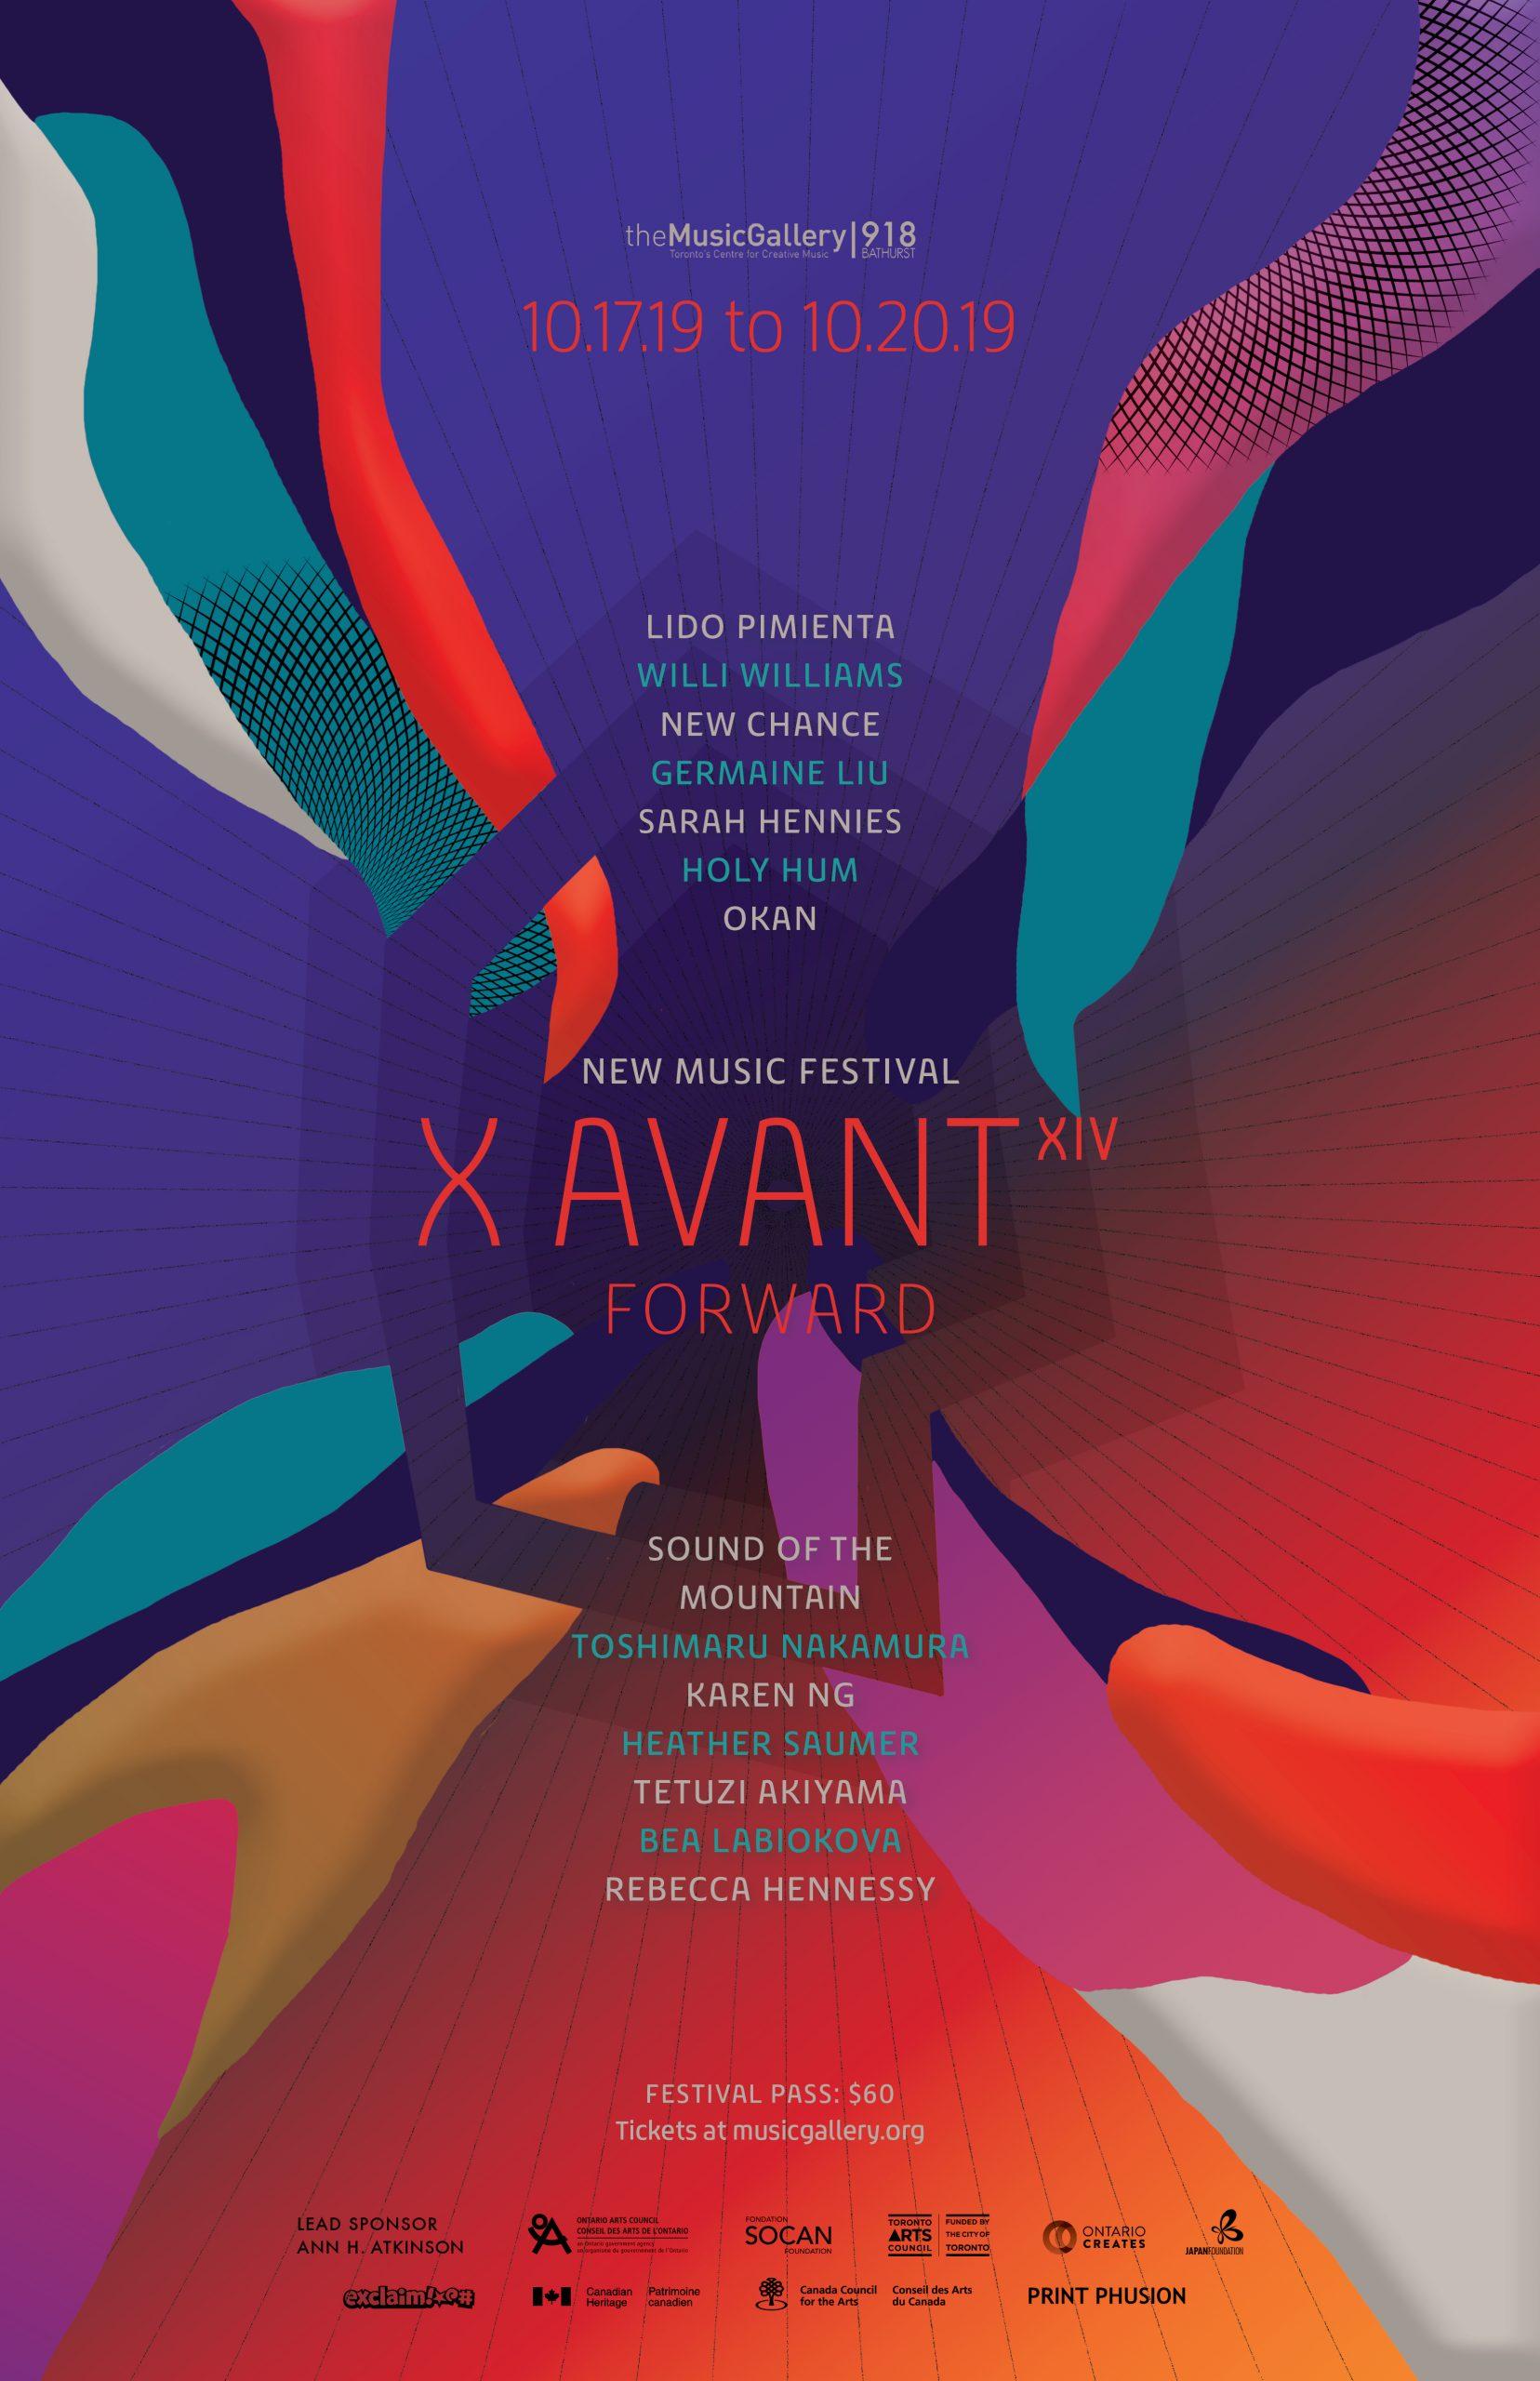 X Avant Poster